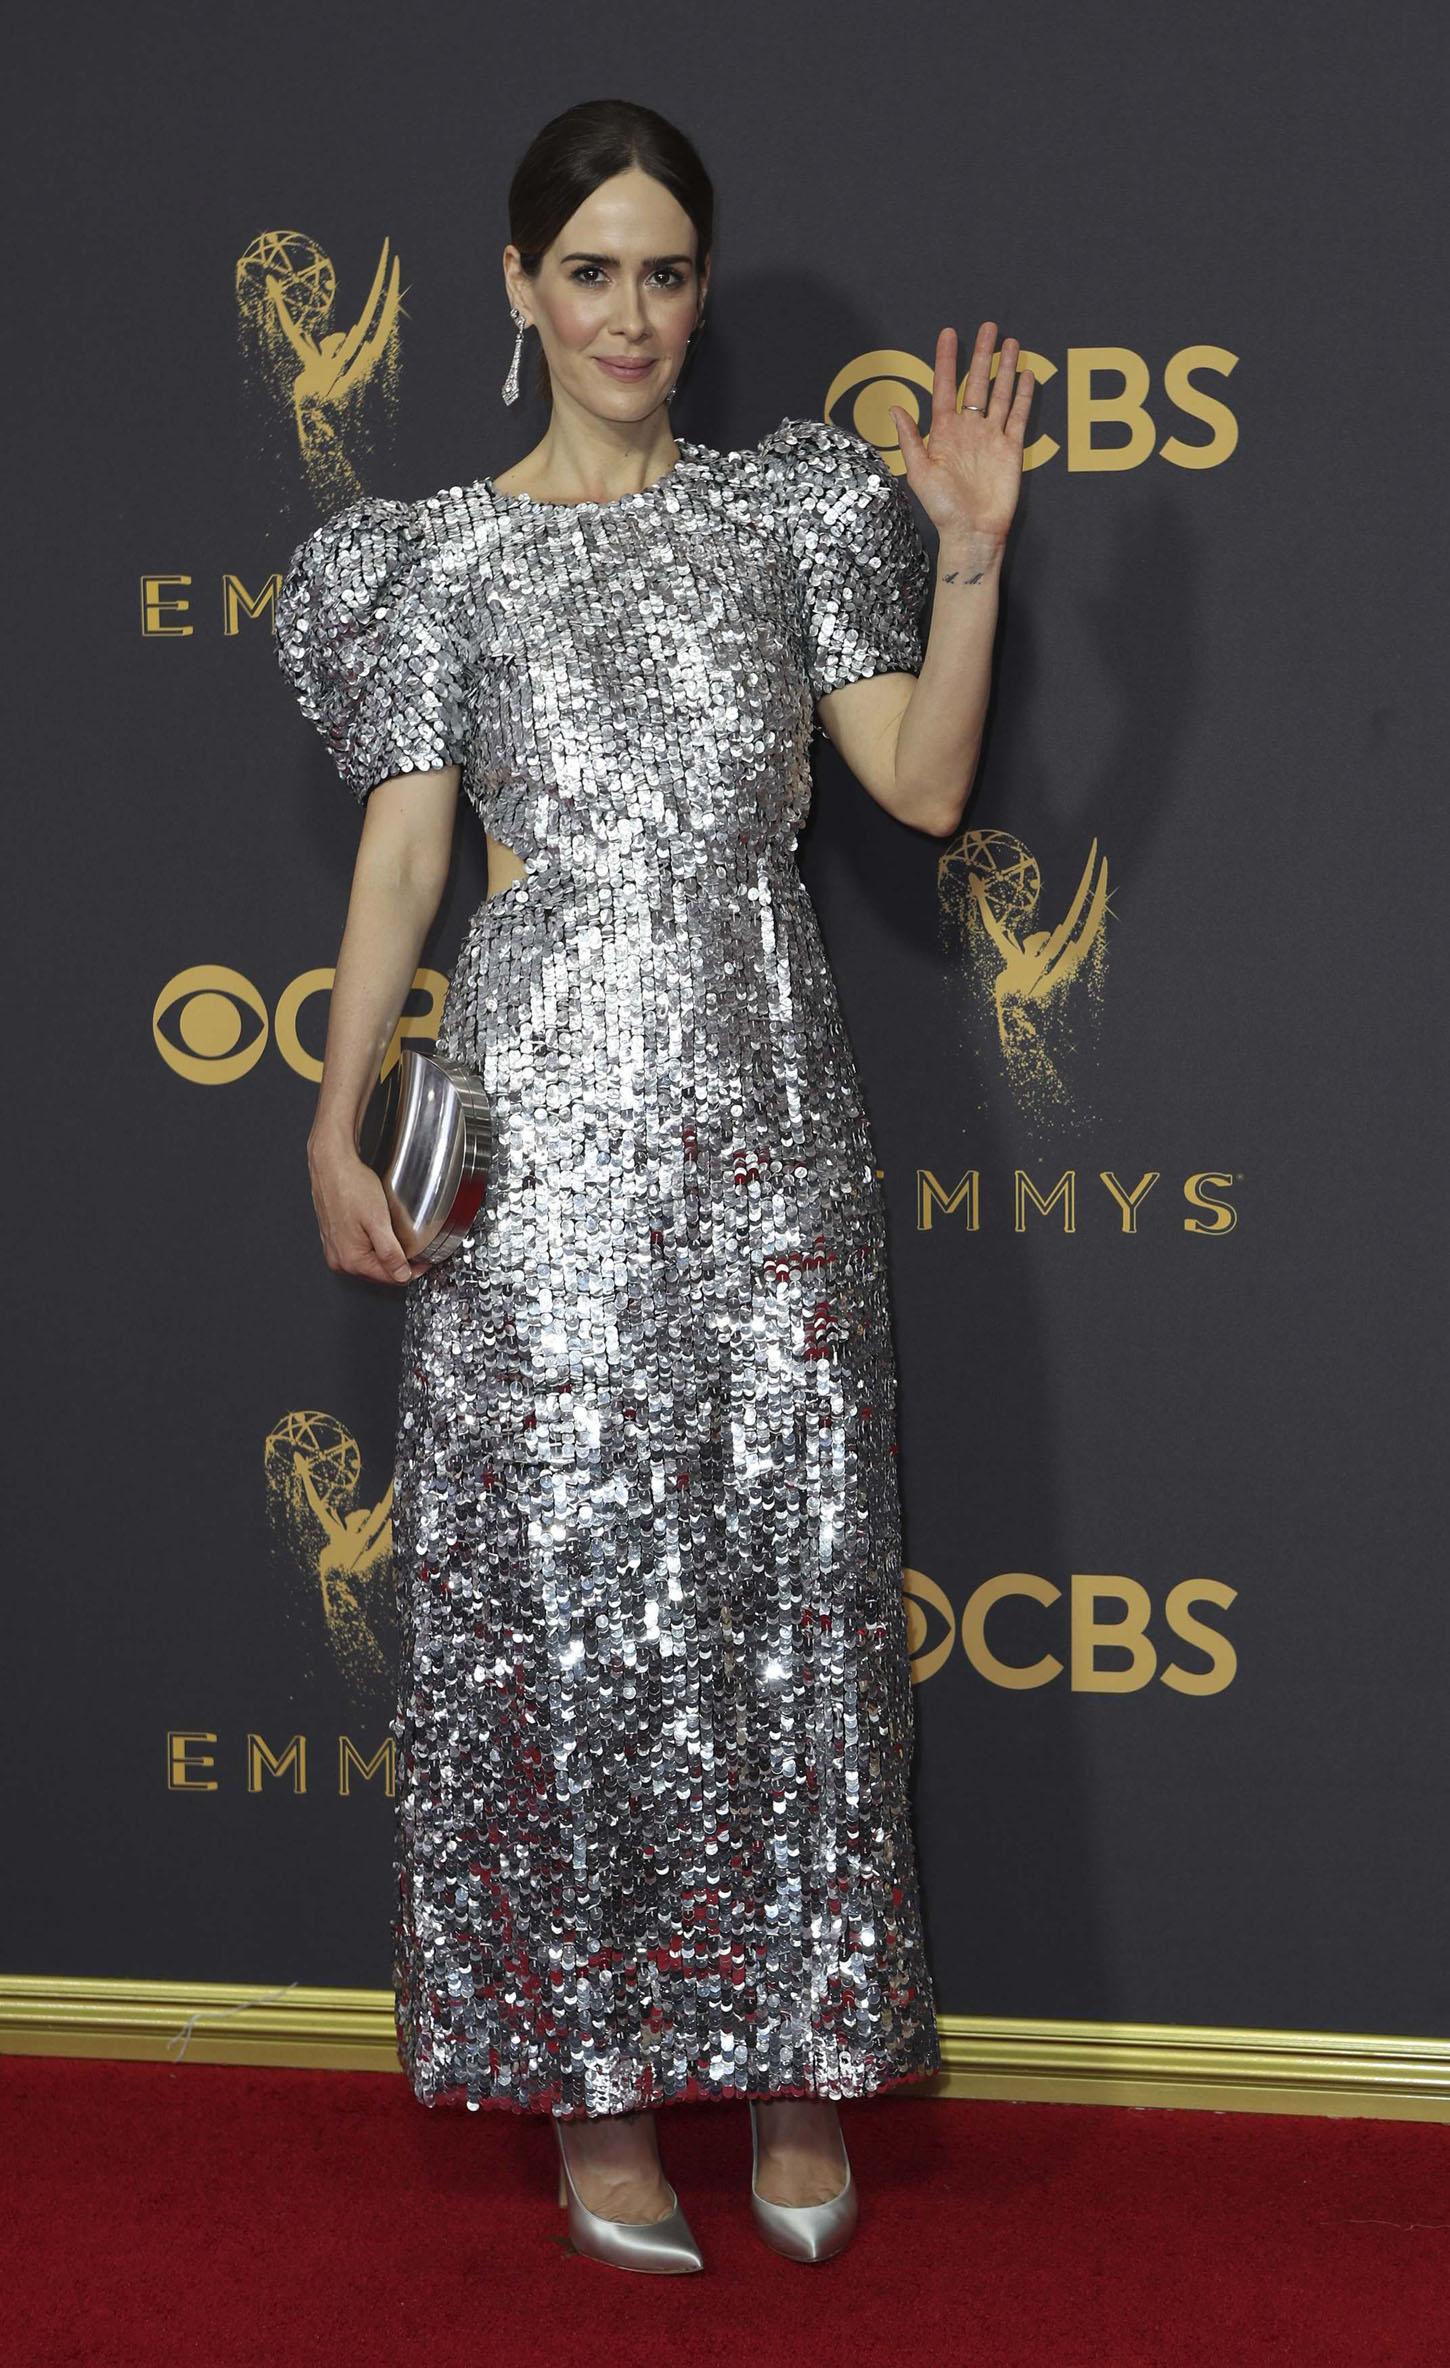 69th Primetime Emmy Awards Äì Arrivals Äì Los Angeles, California, U.S., 17/09/2017 -  Sarah Paulson. REUTERS/Mike Blake